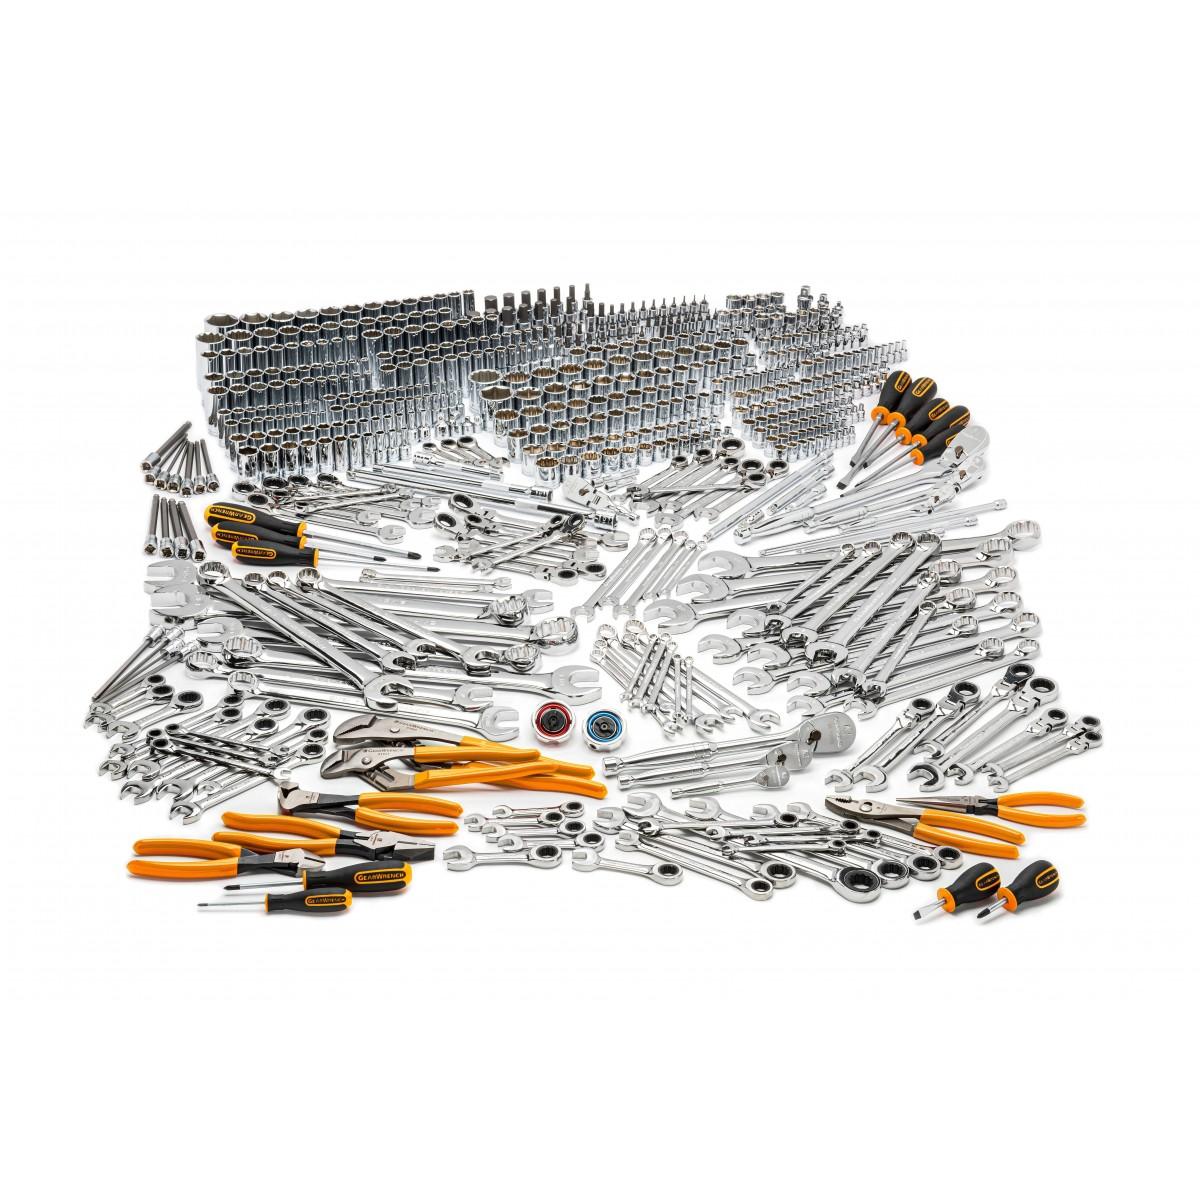 GEARWRENCH® 89060 Master Mechanics 613 piece Hand Tool Set